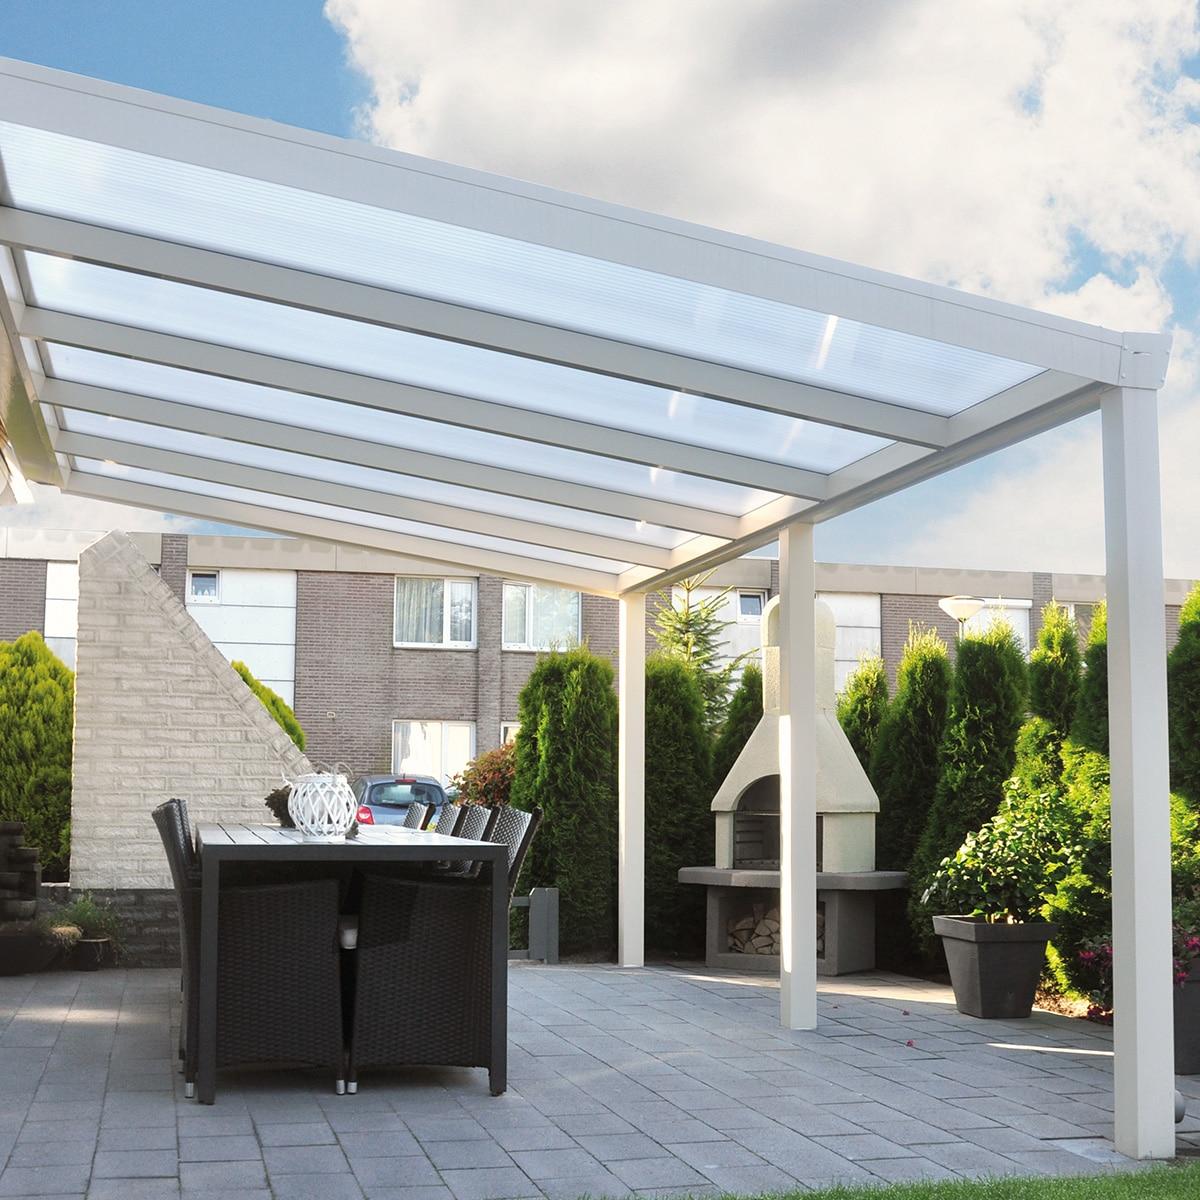 Terrassenüberdachung CC110 Polycarbonat Weiß